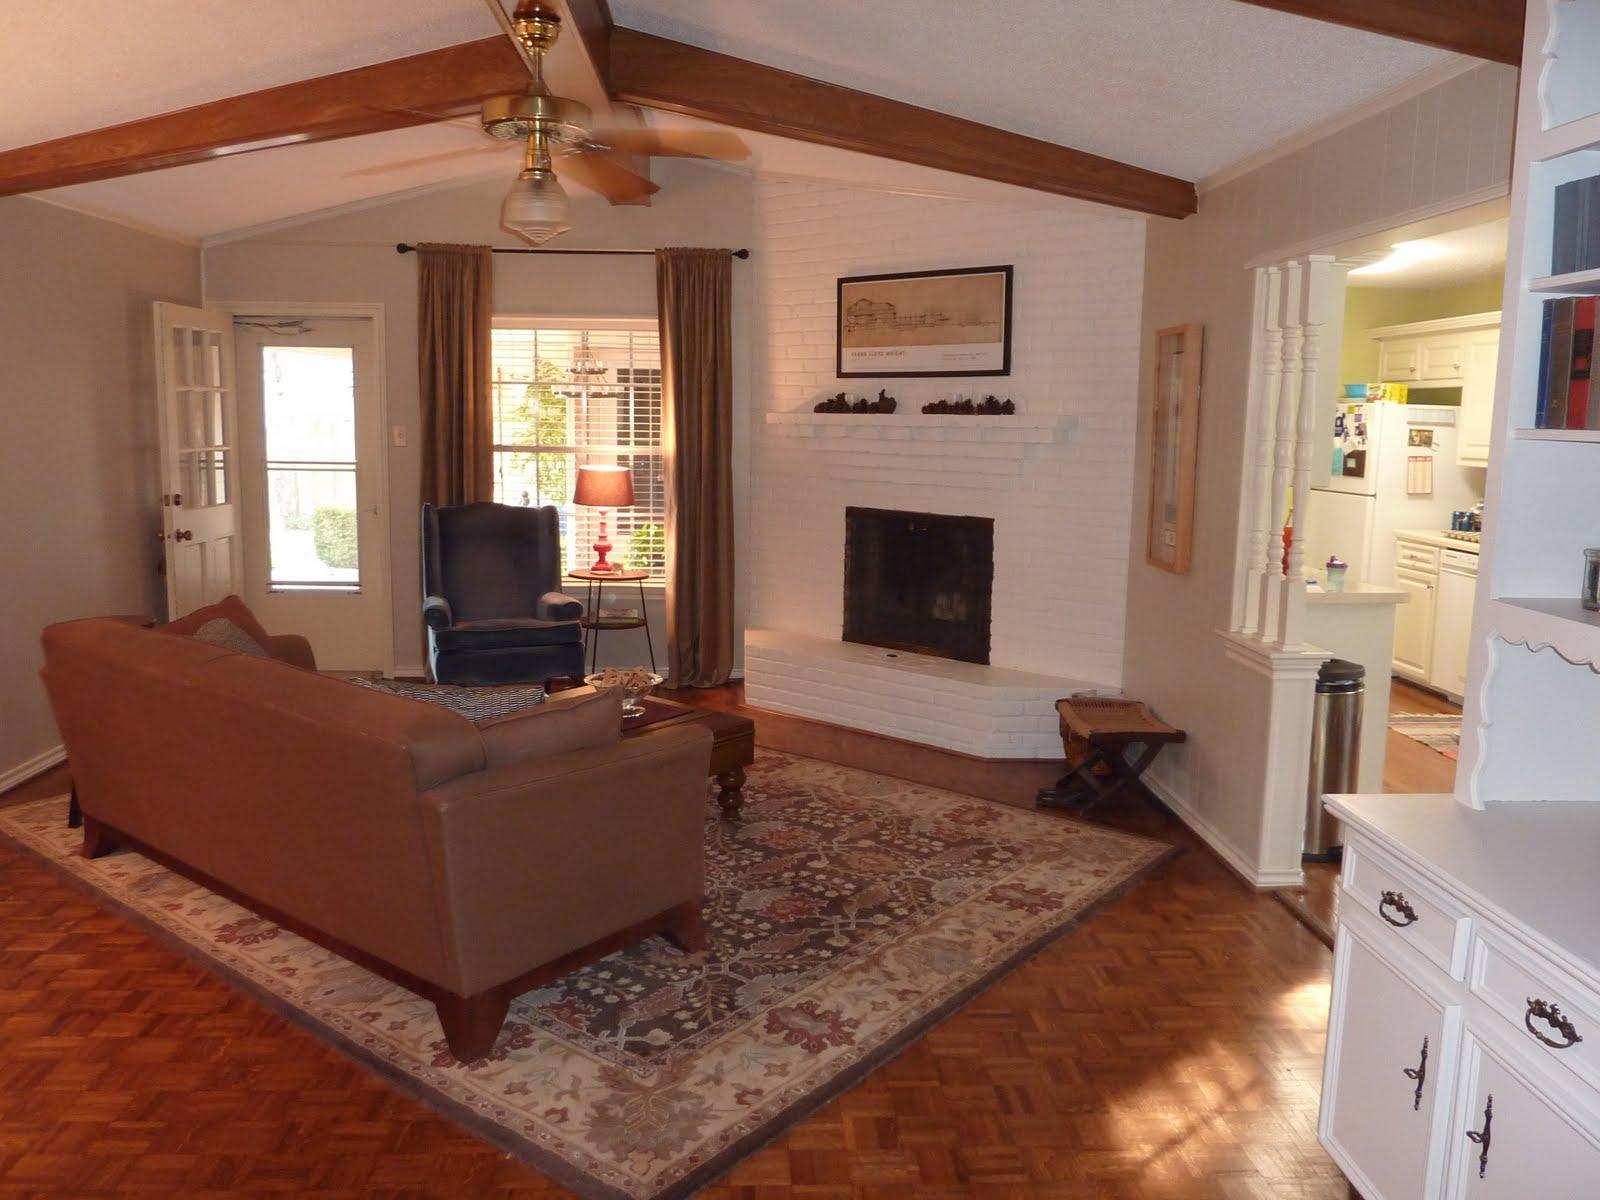 What Color Do I Paint My Living Room La Maison Boheme Painting My Living Room